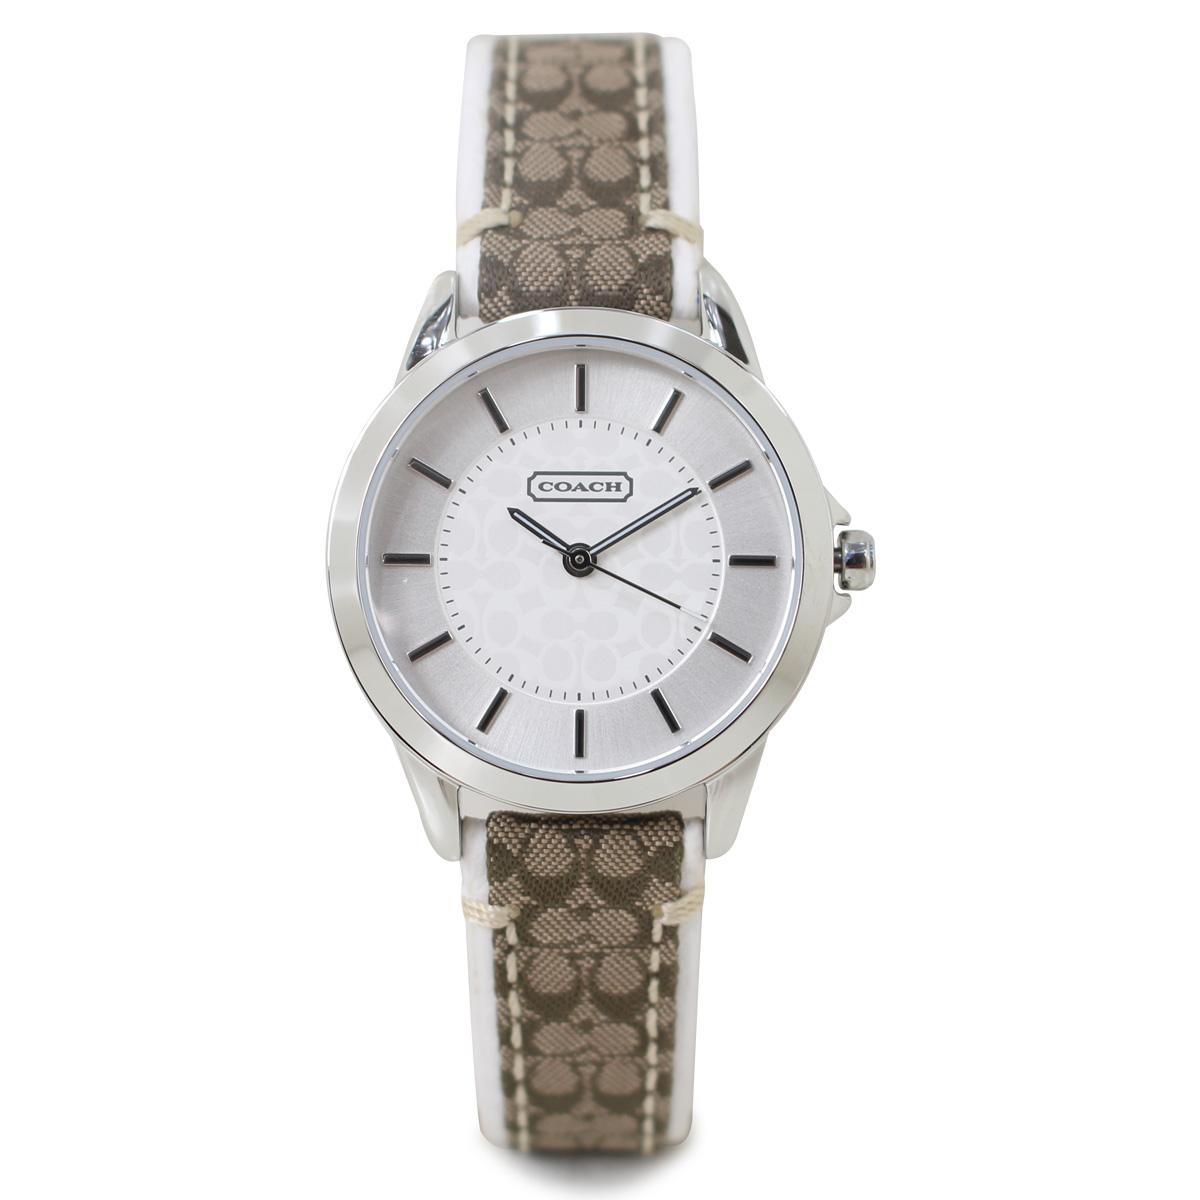 f43e57ebad42 COACH14501526コーチ腕時計レディースシグネチャーレザーブラウン[5/22新入荷][186] サングラス 品最安価格!